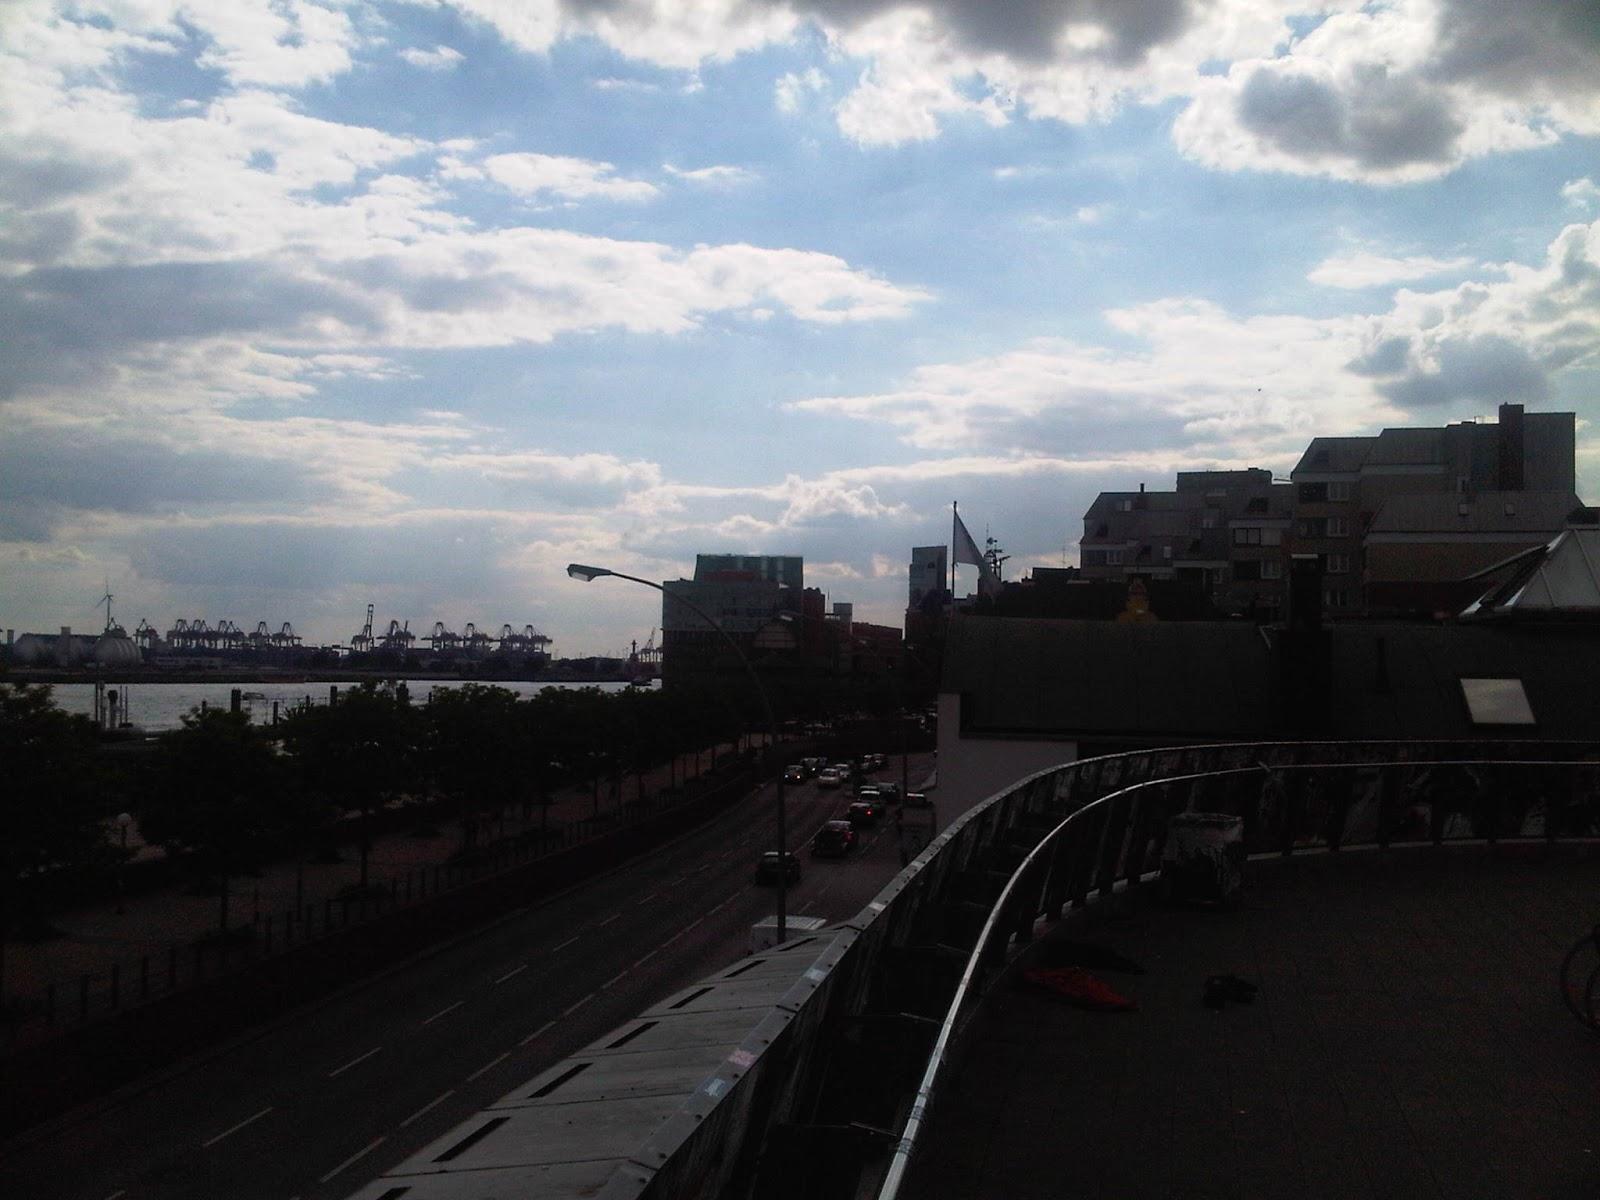 Blick elbabwärts an den Häusern entlang. Elbe, Kräne, Hafen, blauer Himmel, Wolken.